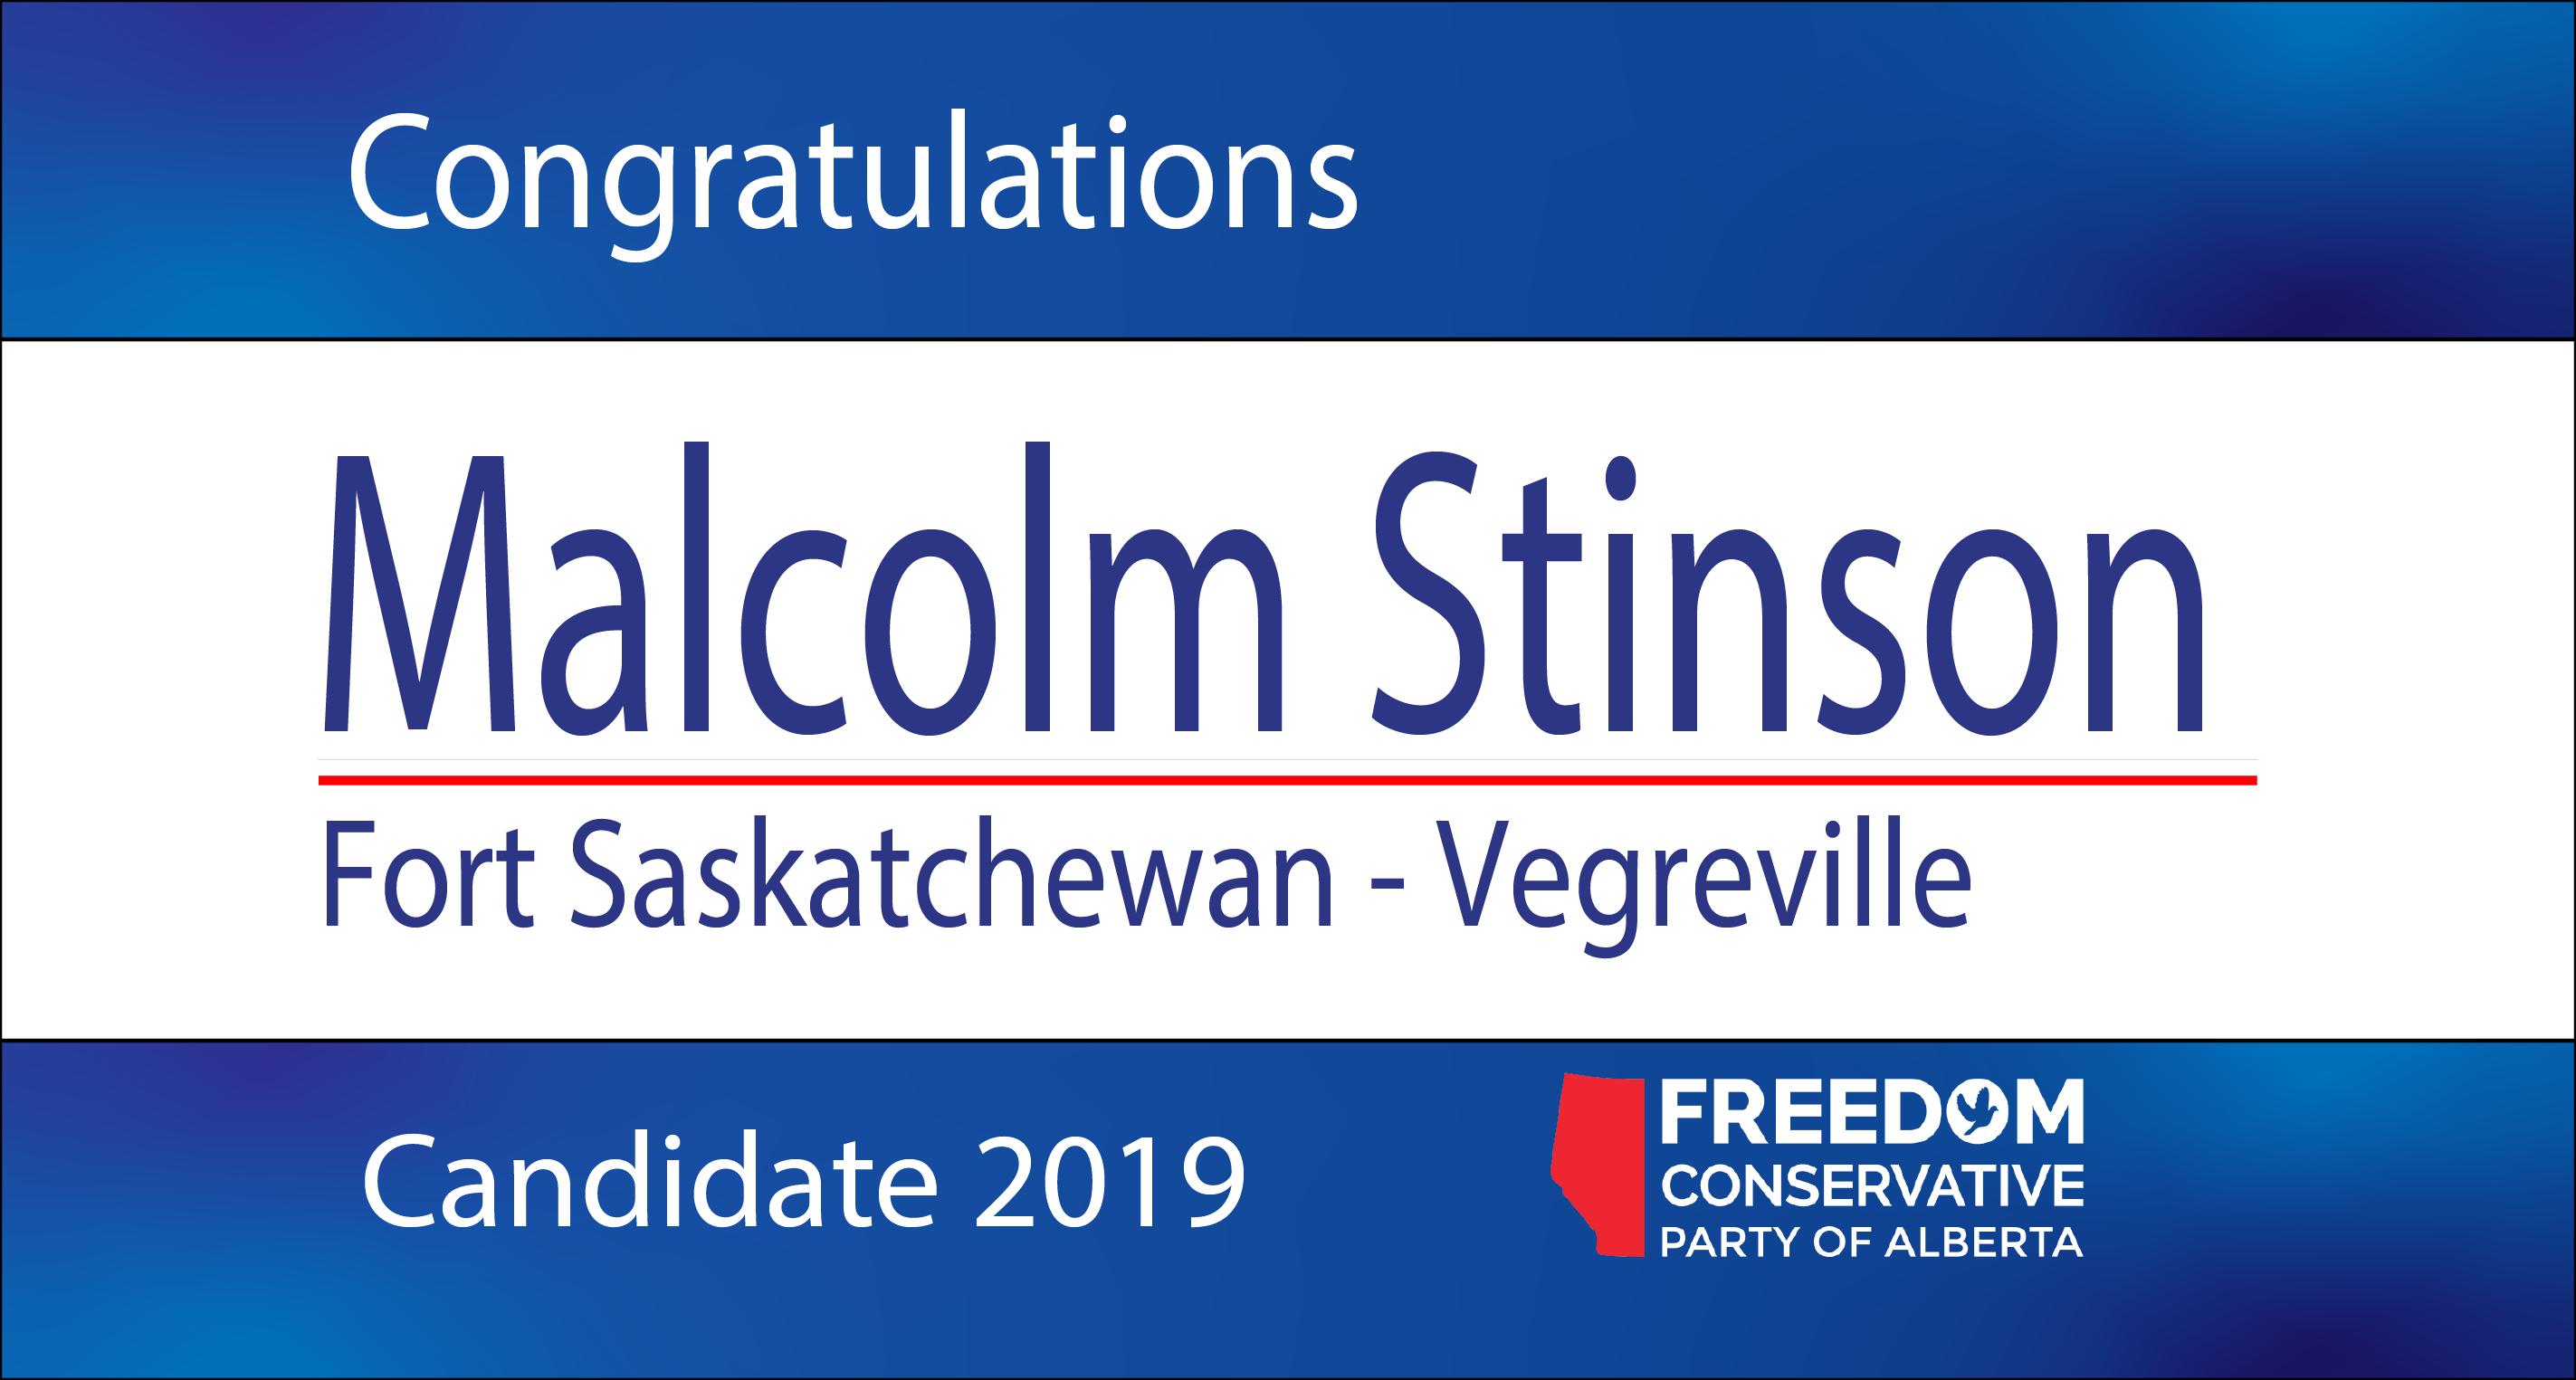 RELEASE: Malcolm Stinson Nominated as FCP Candidate for Fort Saskatchewan-Vegreville